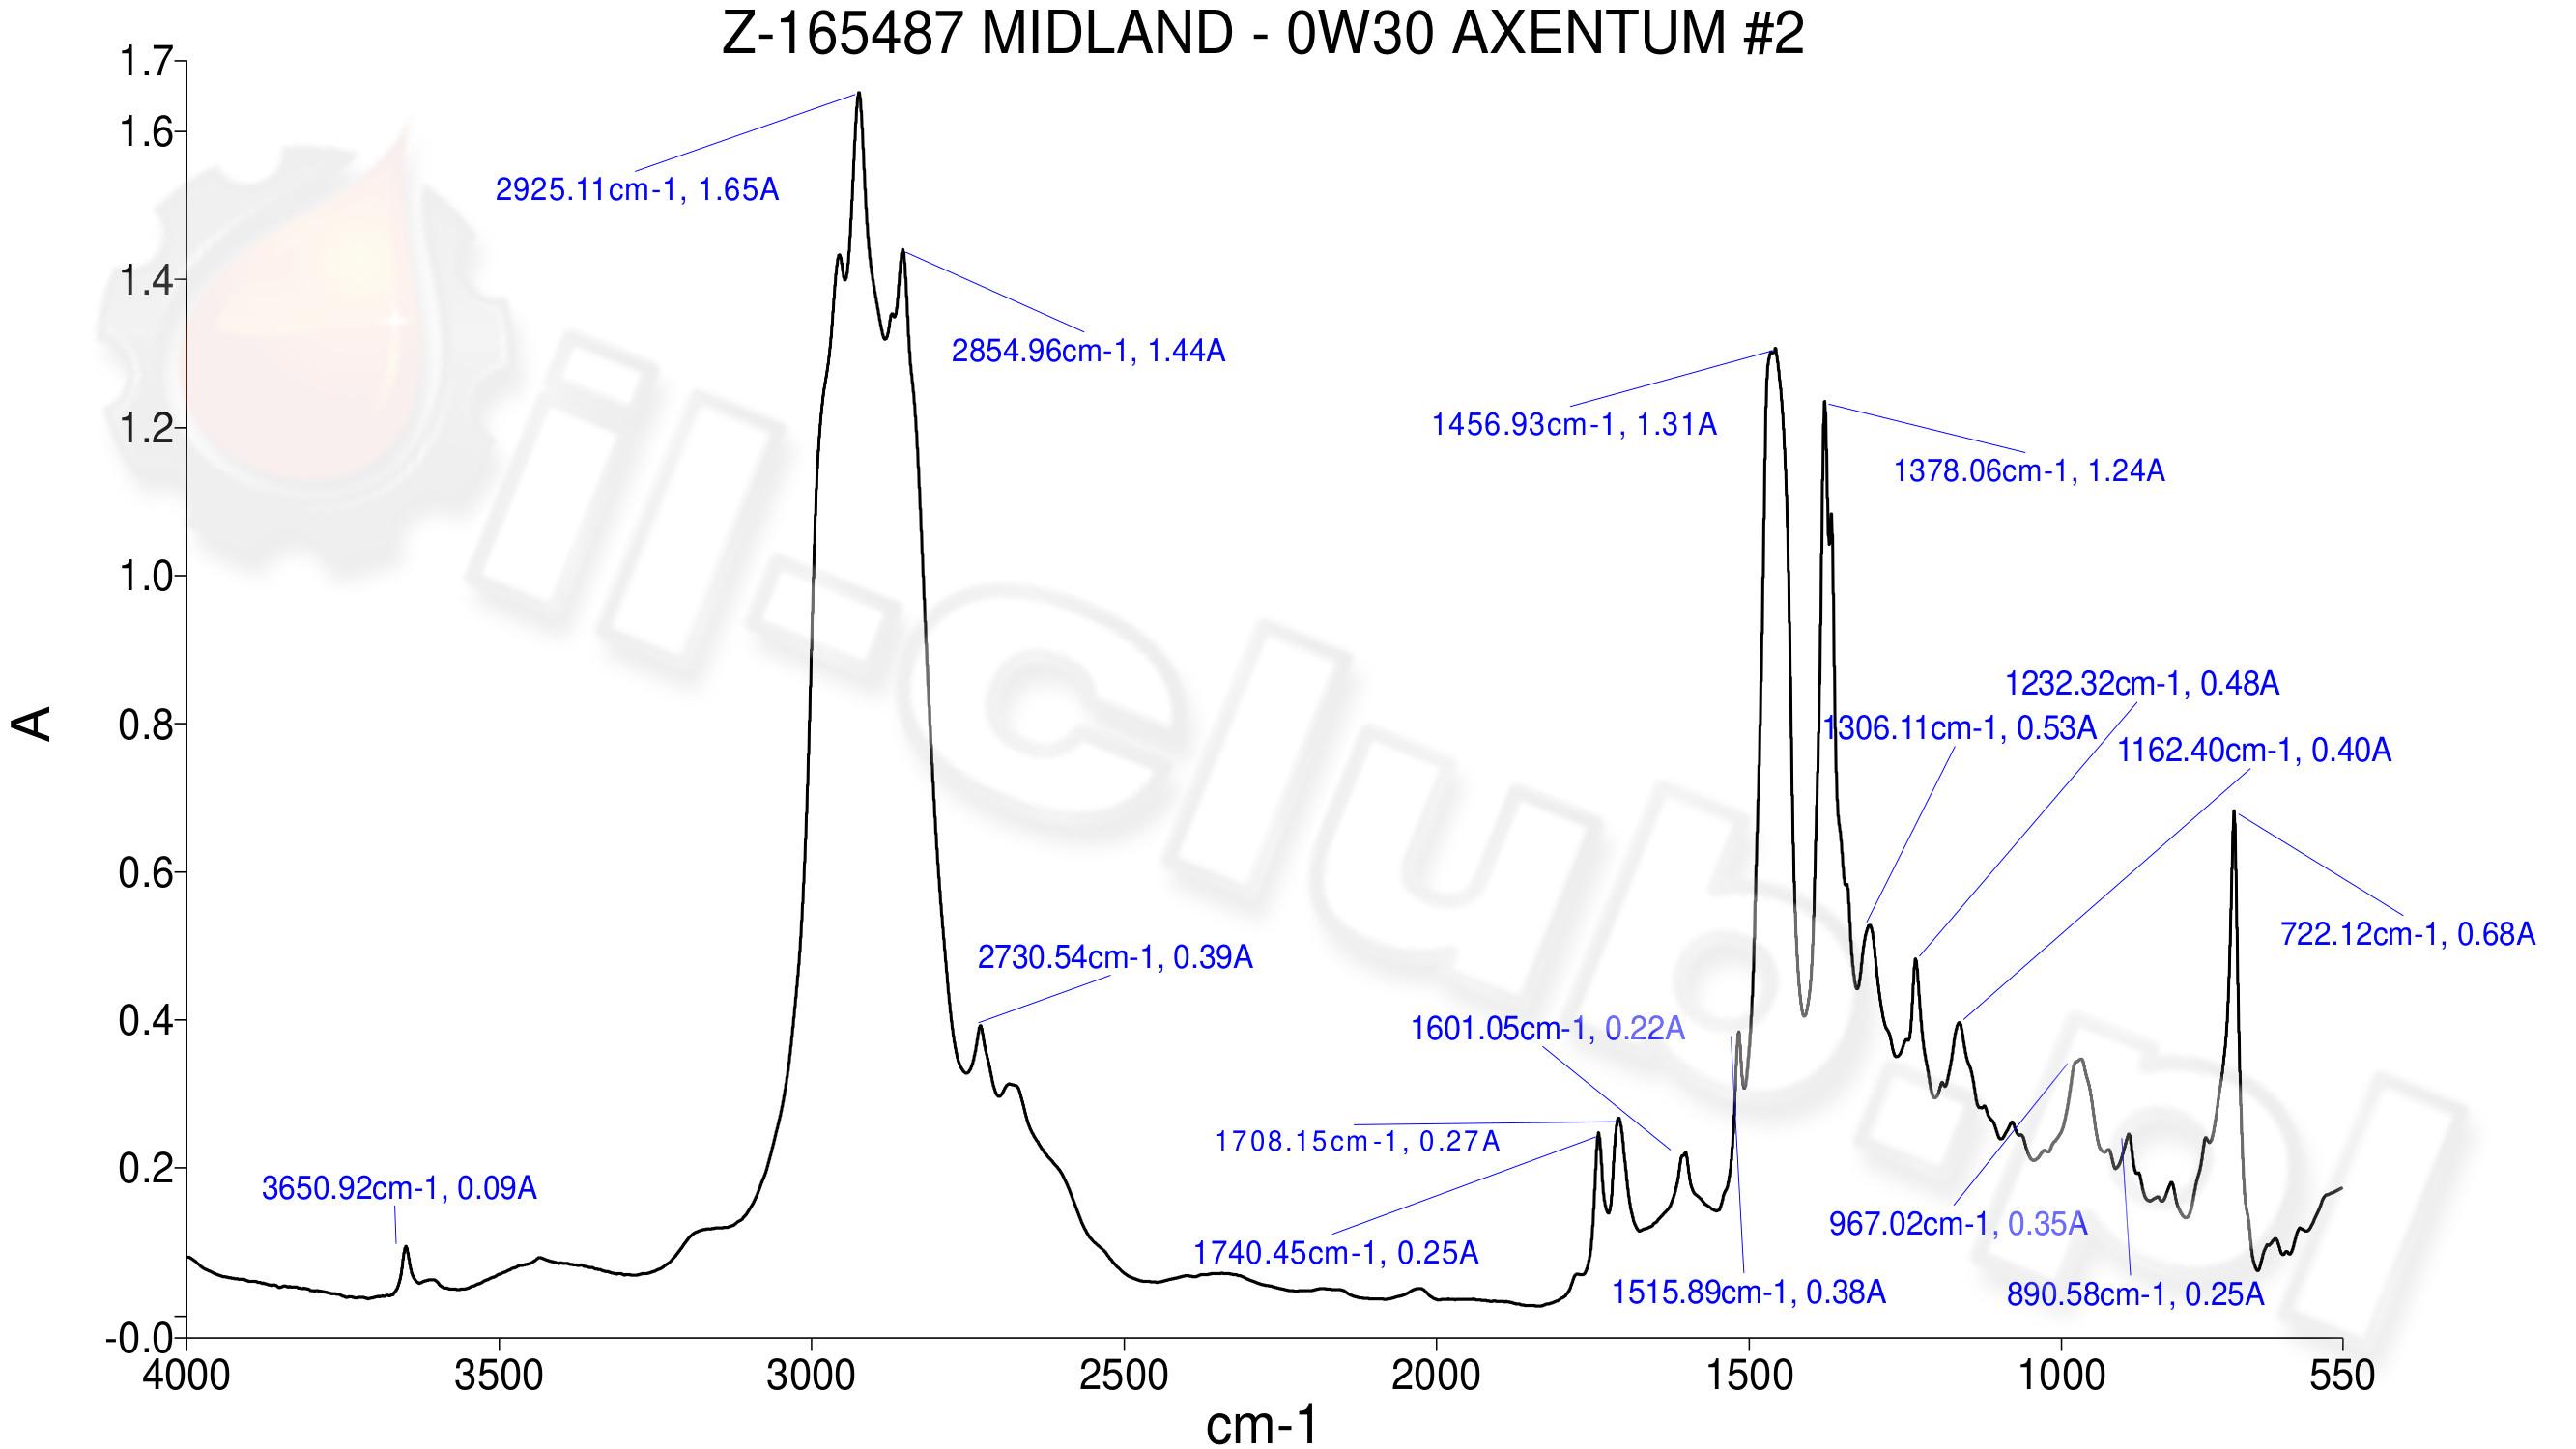 midland-axentum-0w30-ir1.jpg